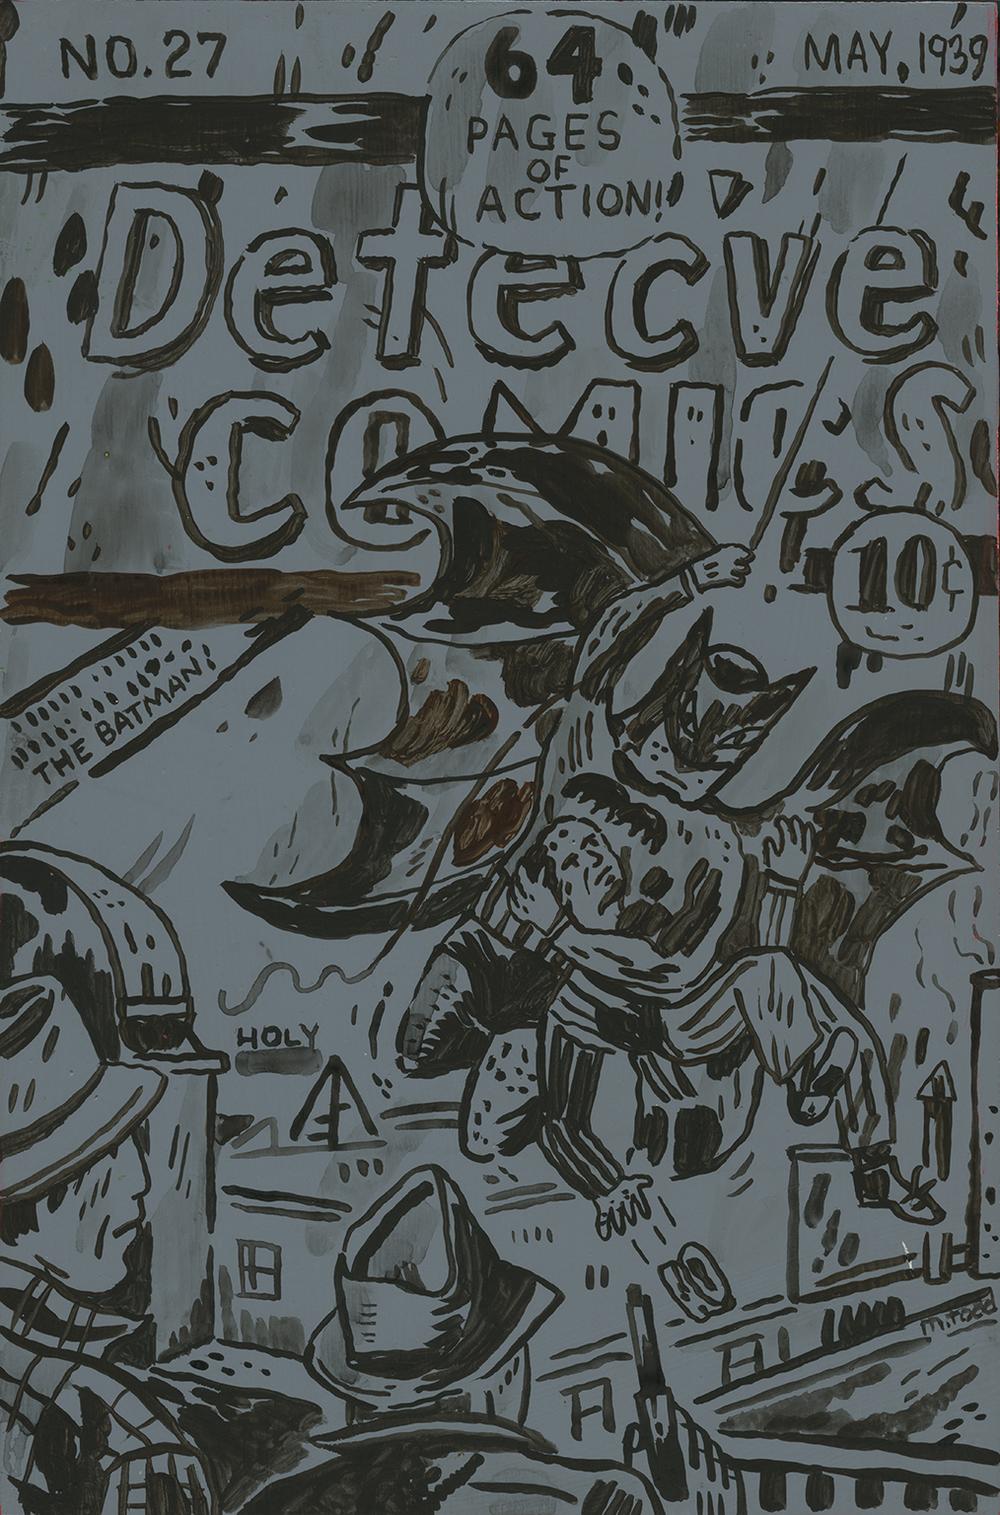 DETEC'VE COMICS acrylic and cel vinyl on panel, 6.75x10.25 in.